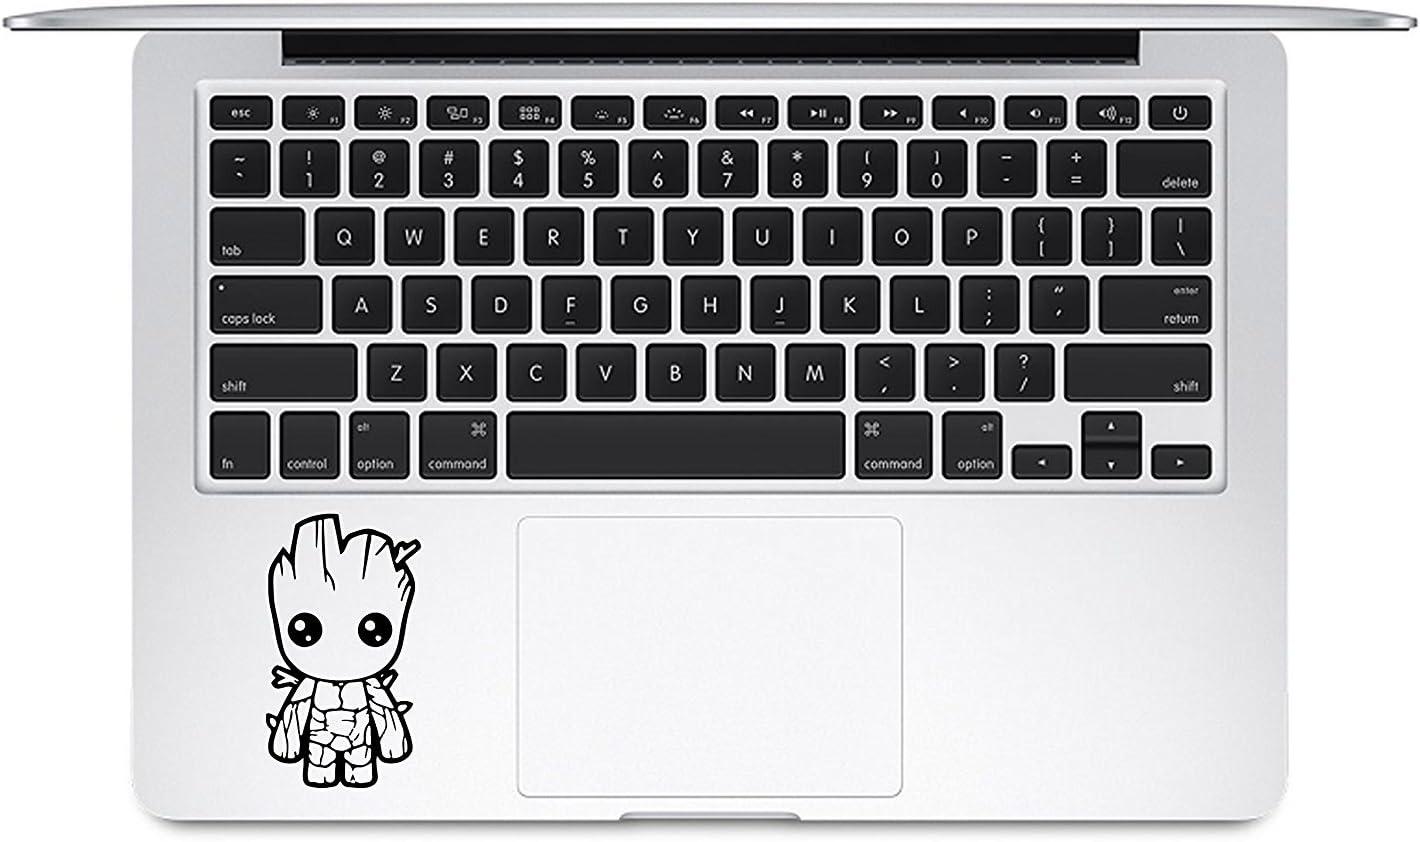 Cute Baby Groot Guardians Decal Vinyl Laptop Sticker | Black | 3.5